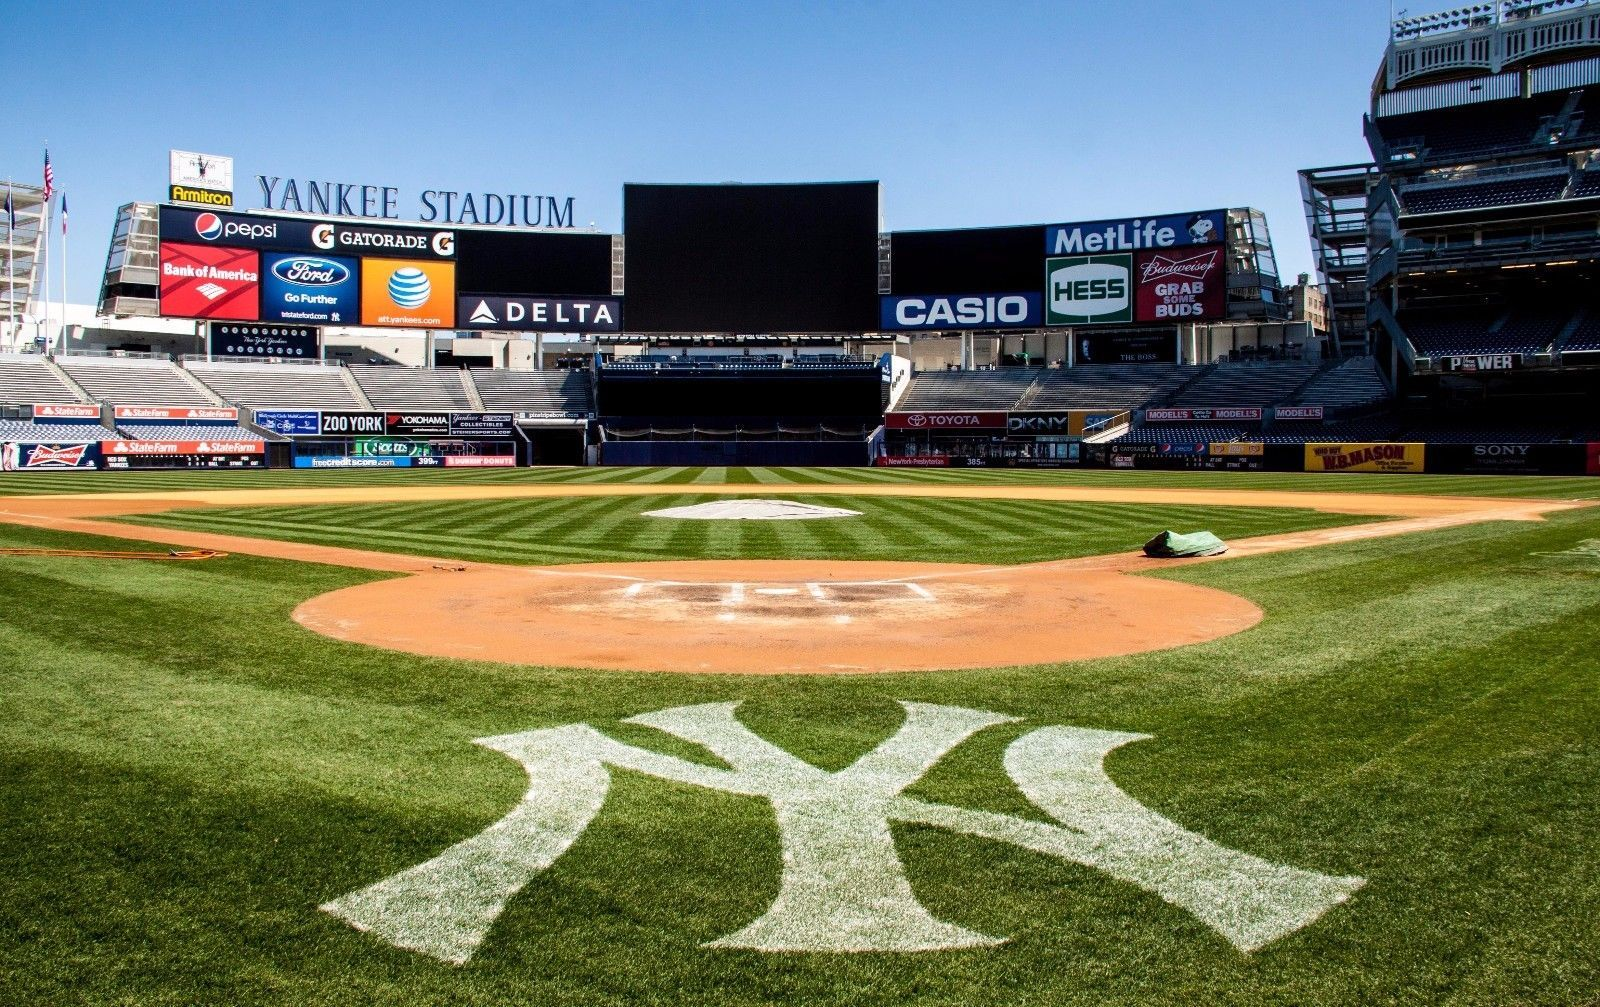 Tickets 4 Field Level Tickets To A 2018 Yankees Game Of Your Choice Please Retweet Yankee Stadium Stadium Baseball Stadium